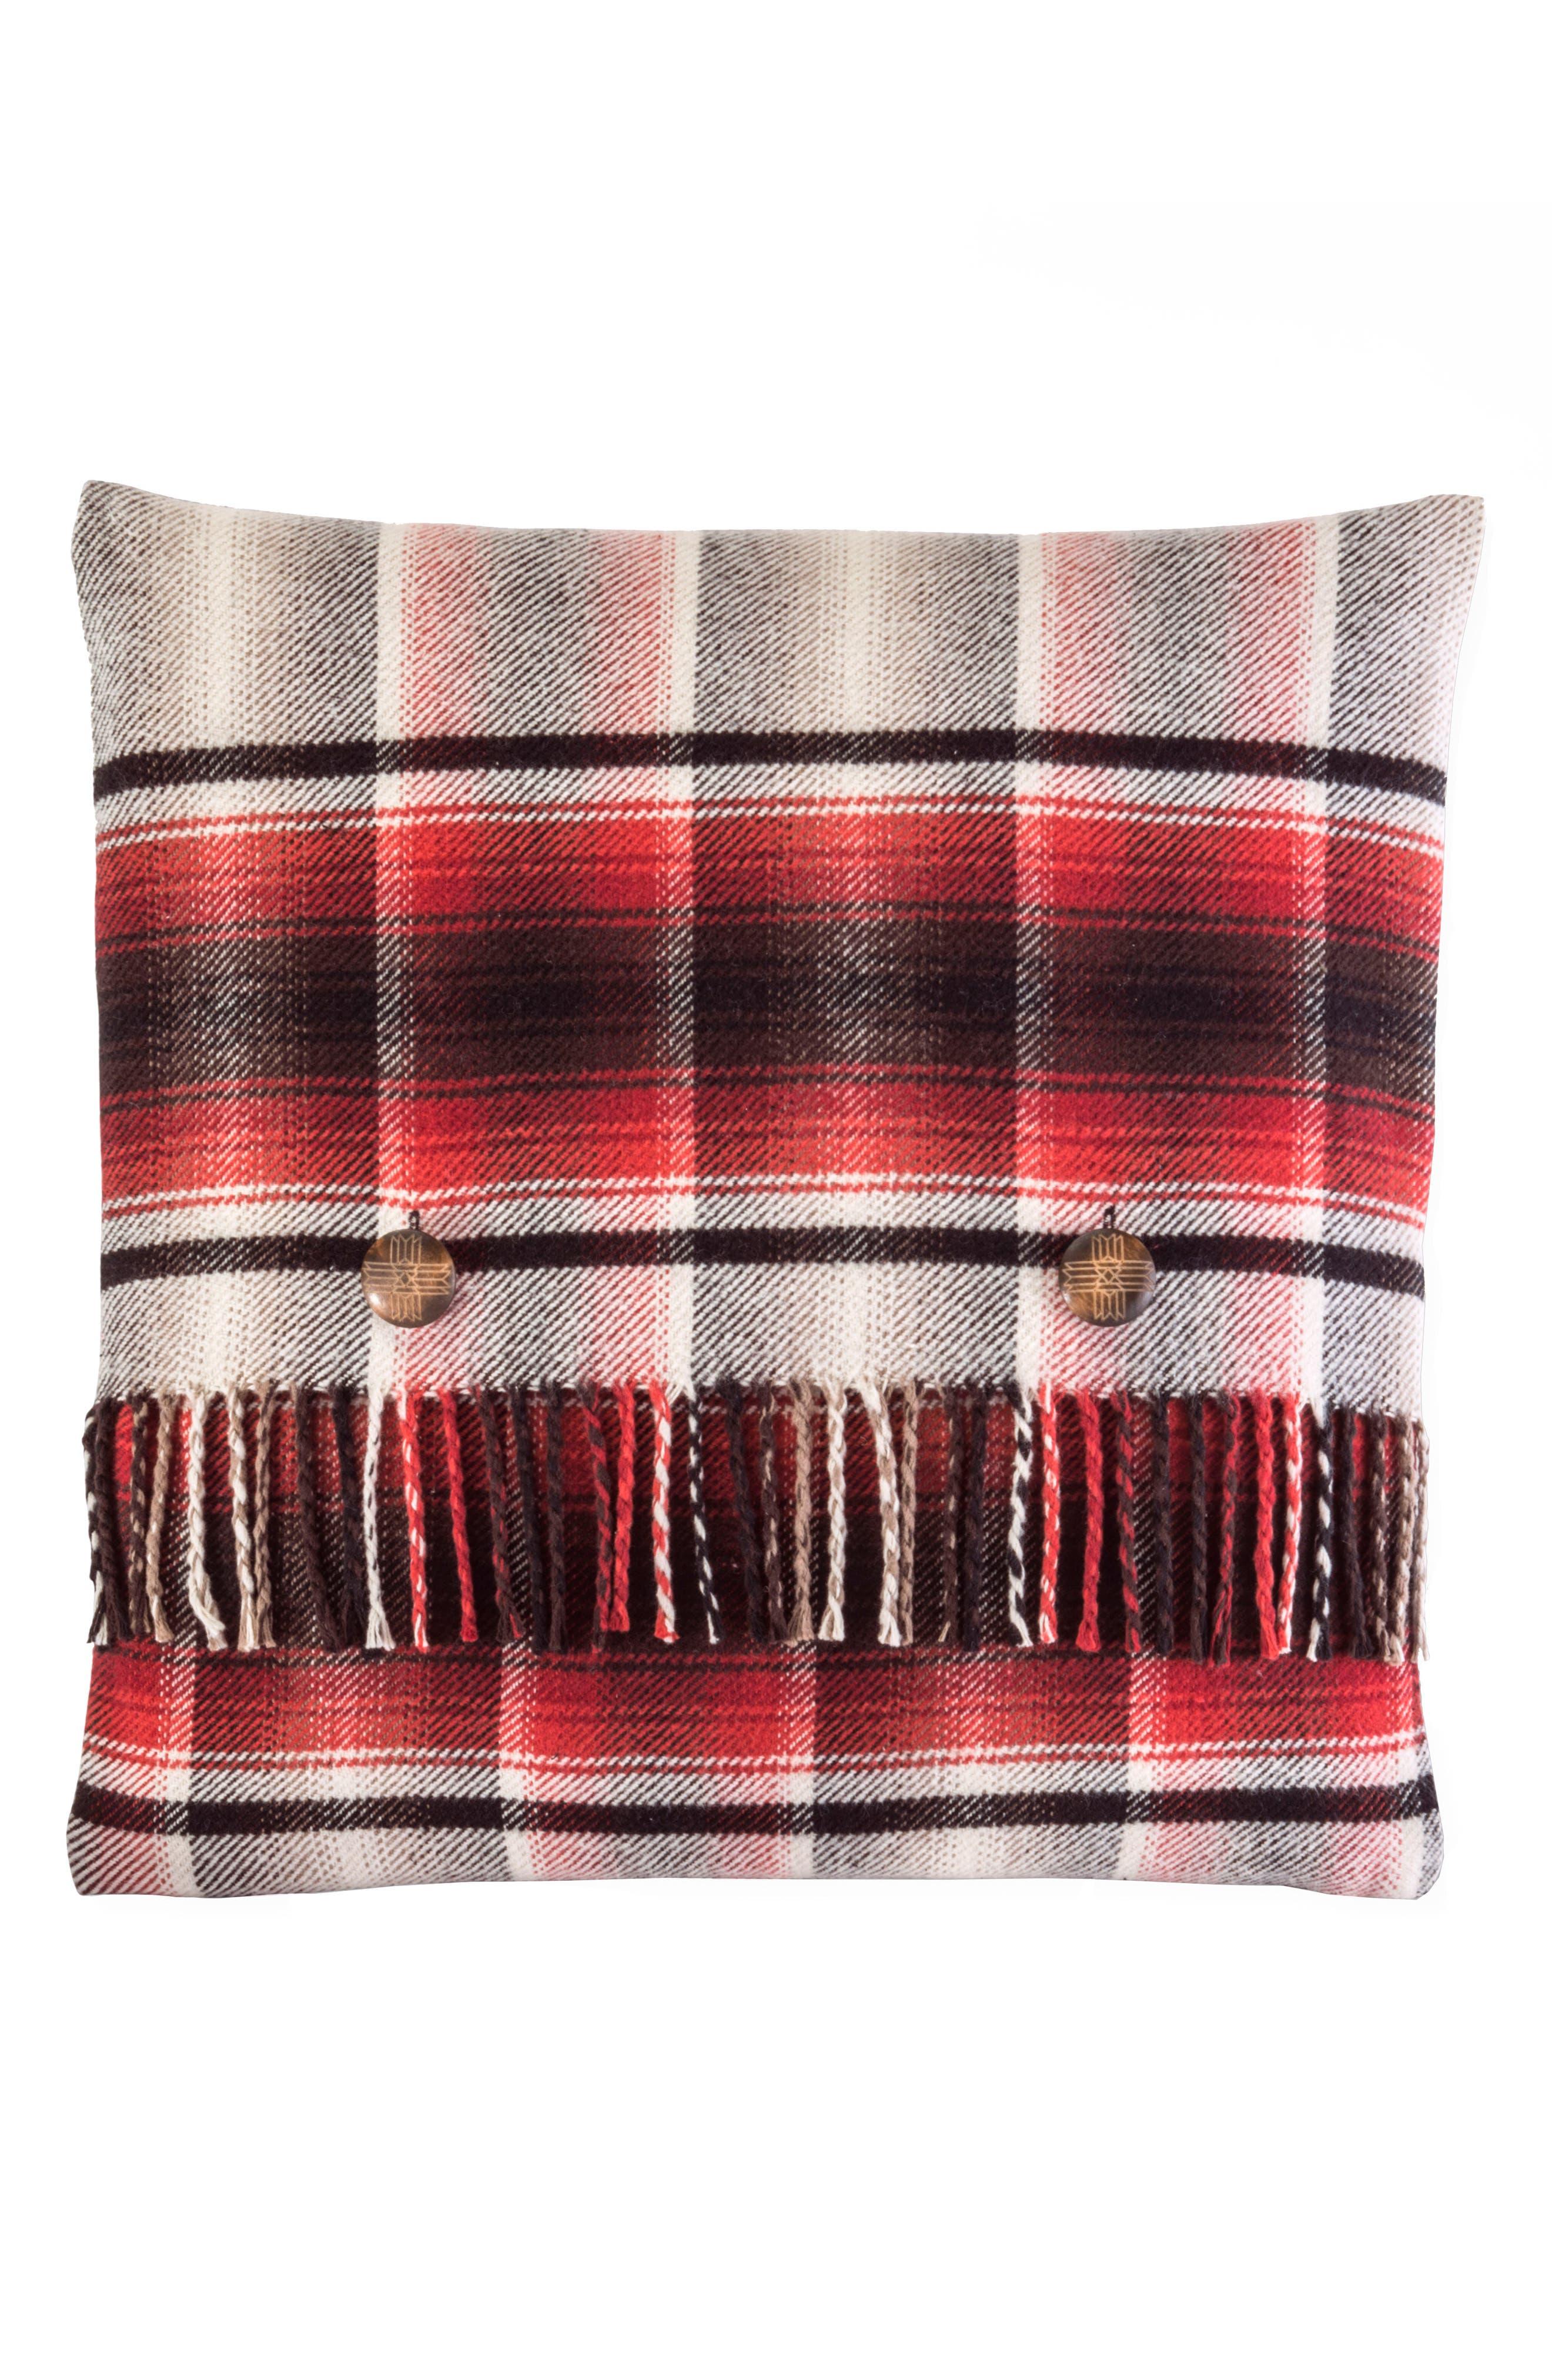 Alternate Image 1 Selected - Pendleton Board Shirt Plaid Pillow